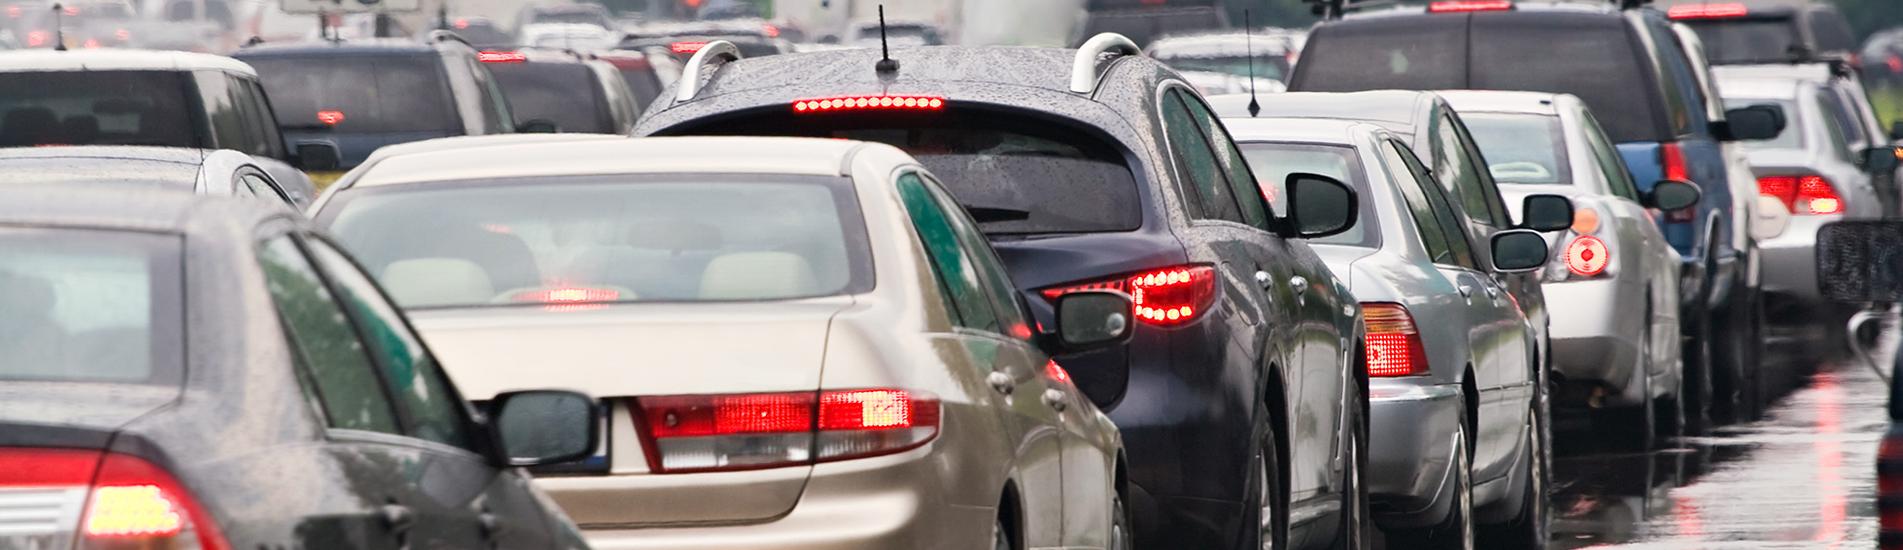 Concord Chiropractor - Auto Accident - Neck Pain